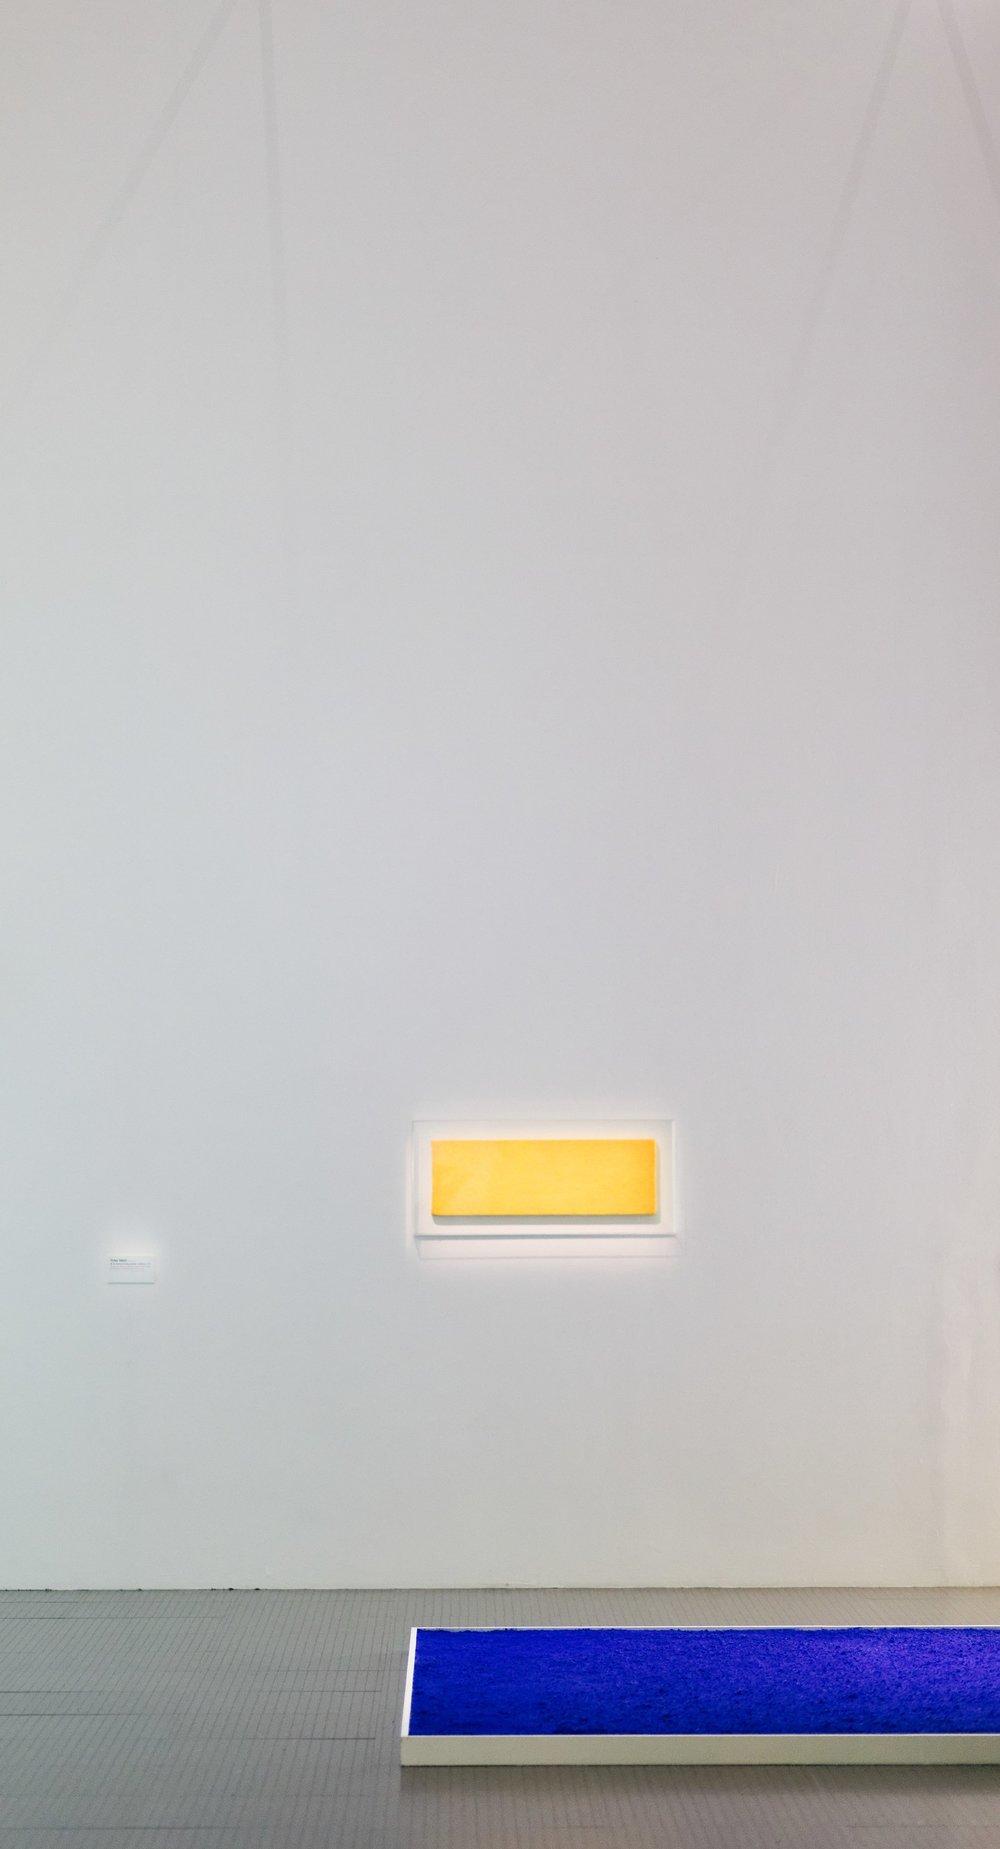 Centre+pompidou+metz+%2825%29.jpg